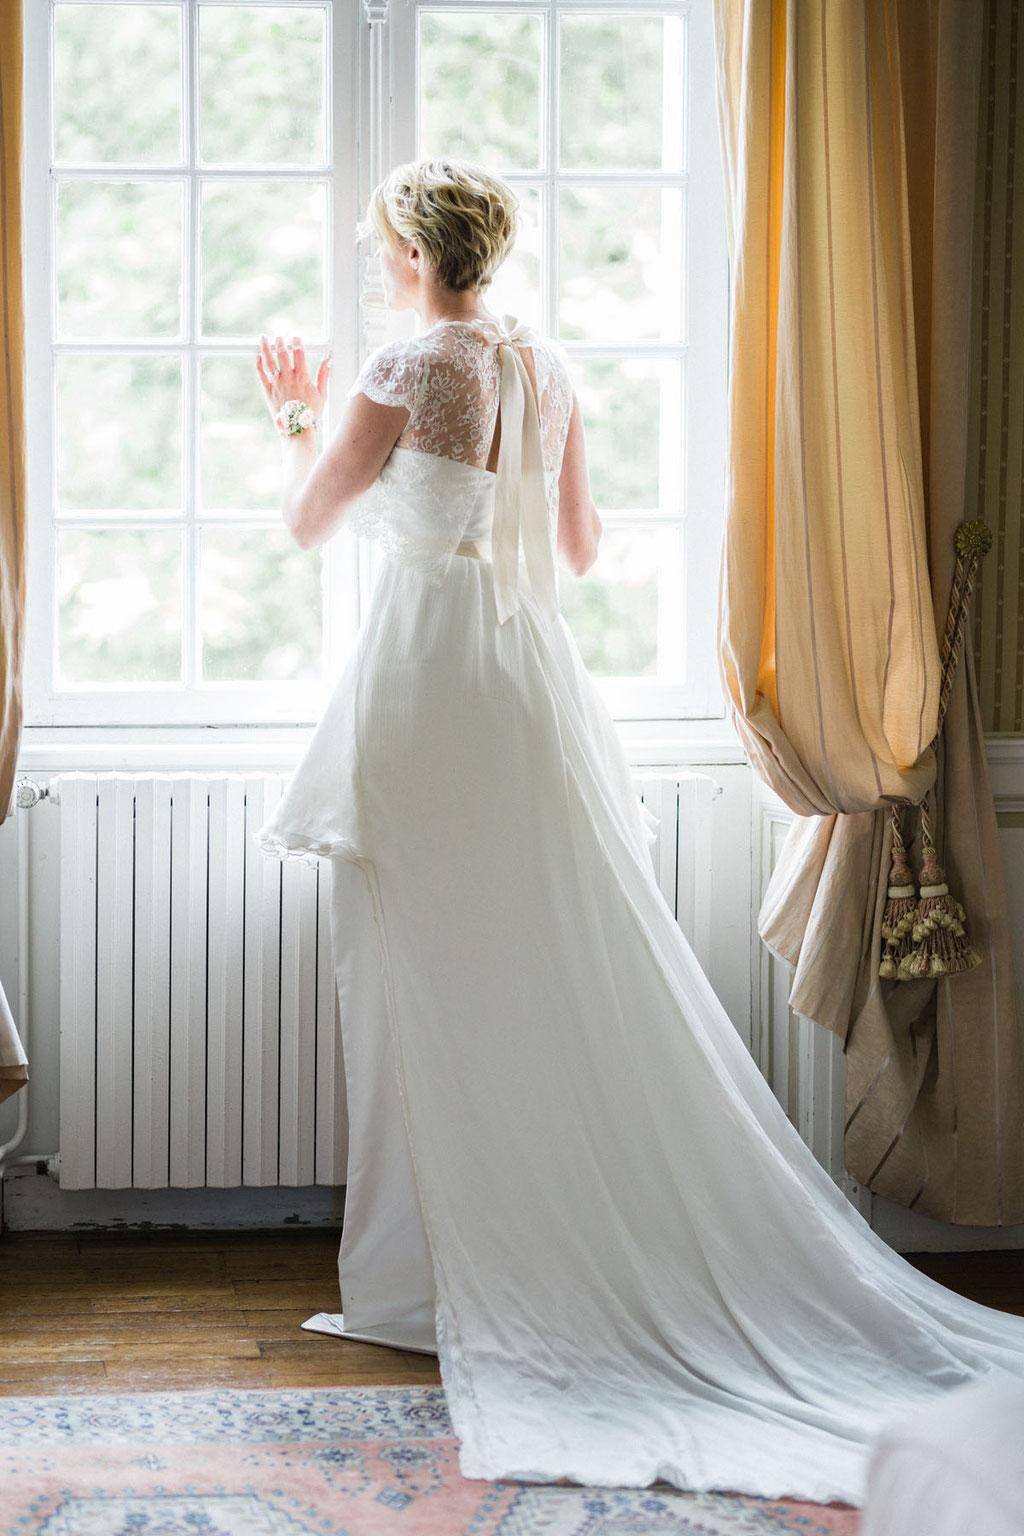 photographe mariage storyteller nantes vendée orlane-photos.com